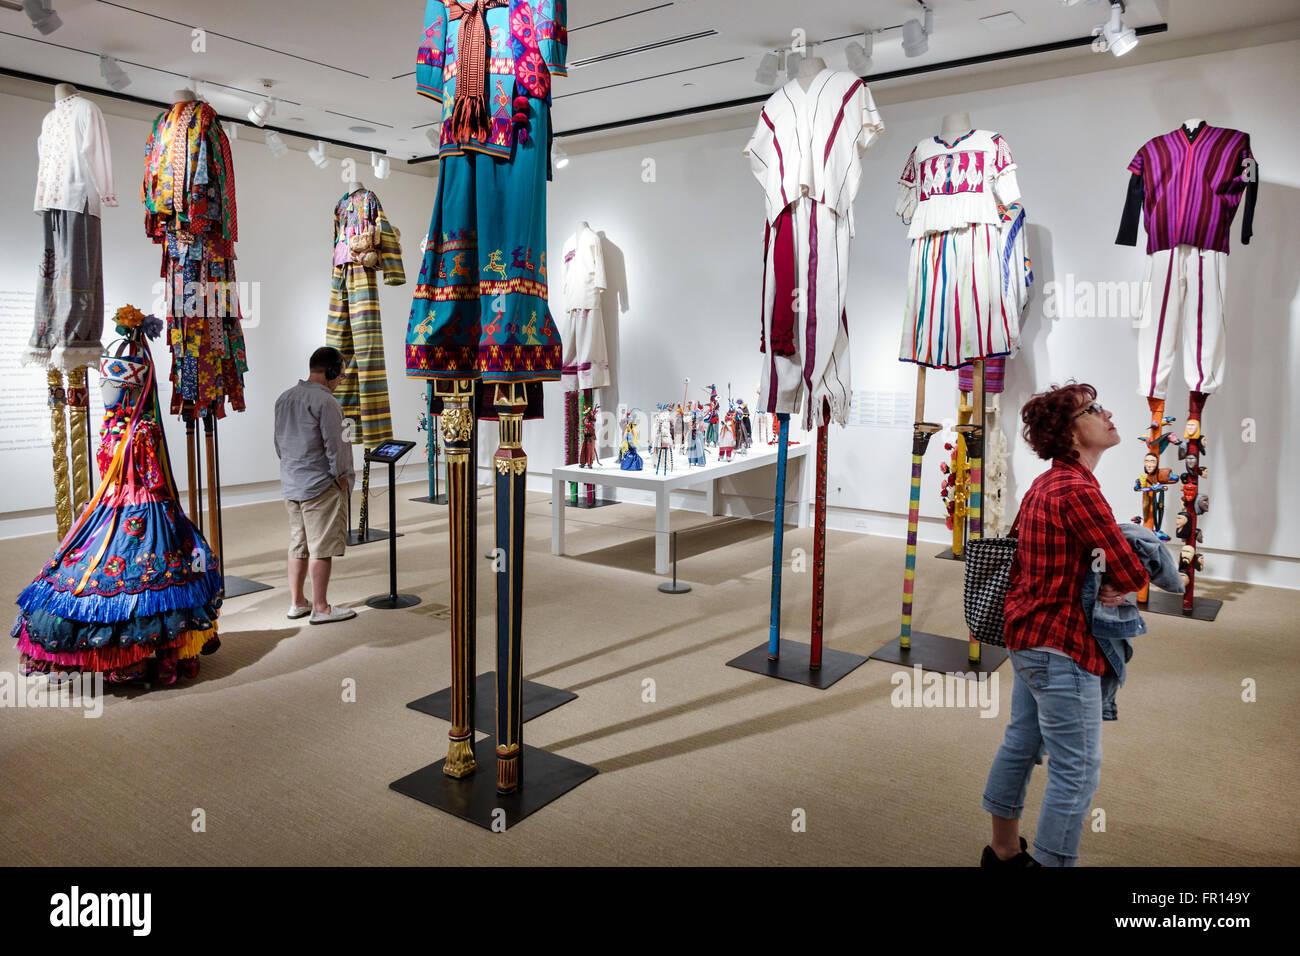 ad913a48ee Florida FL Orlando Winter Park Cornell Fine Arts Museum Rollins College  inside gallery Laura Anderson Barbata